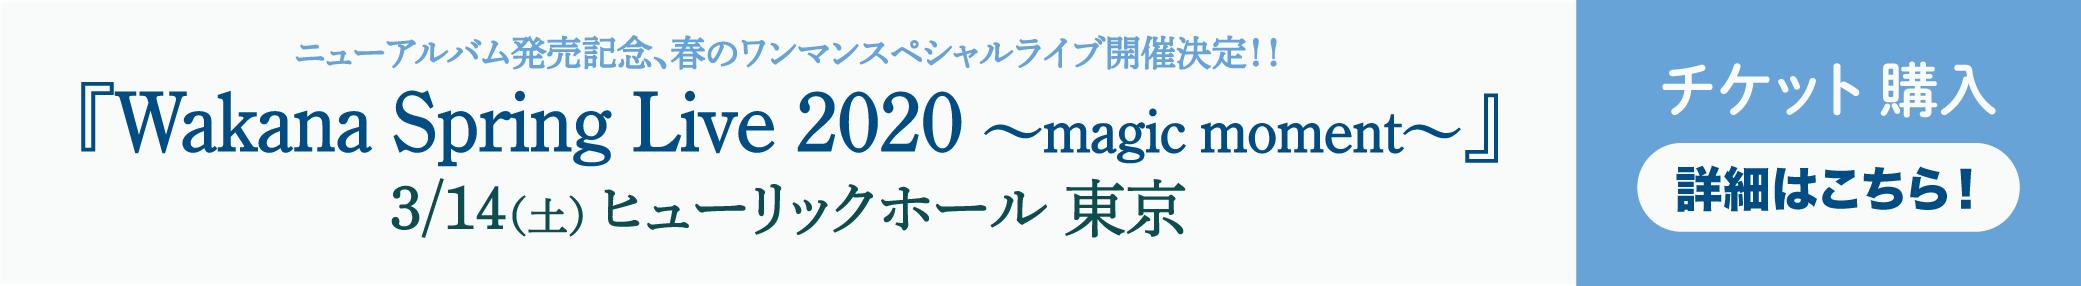 『Wakana Spring Live 2020 ~magic moment~』チケット詳細